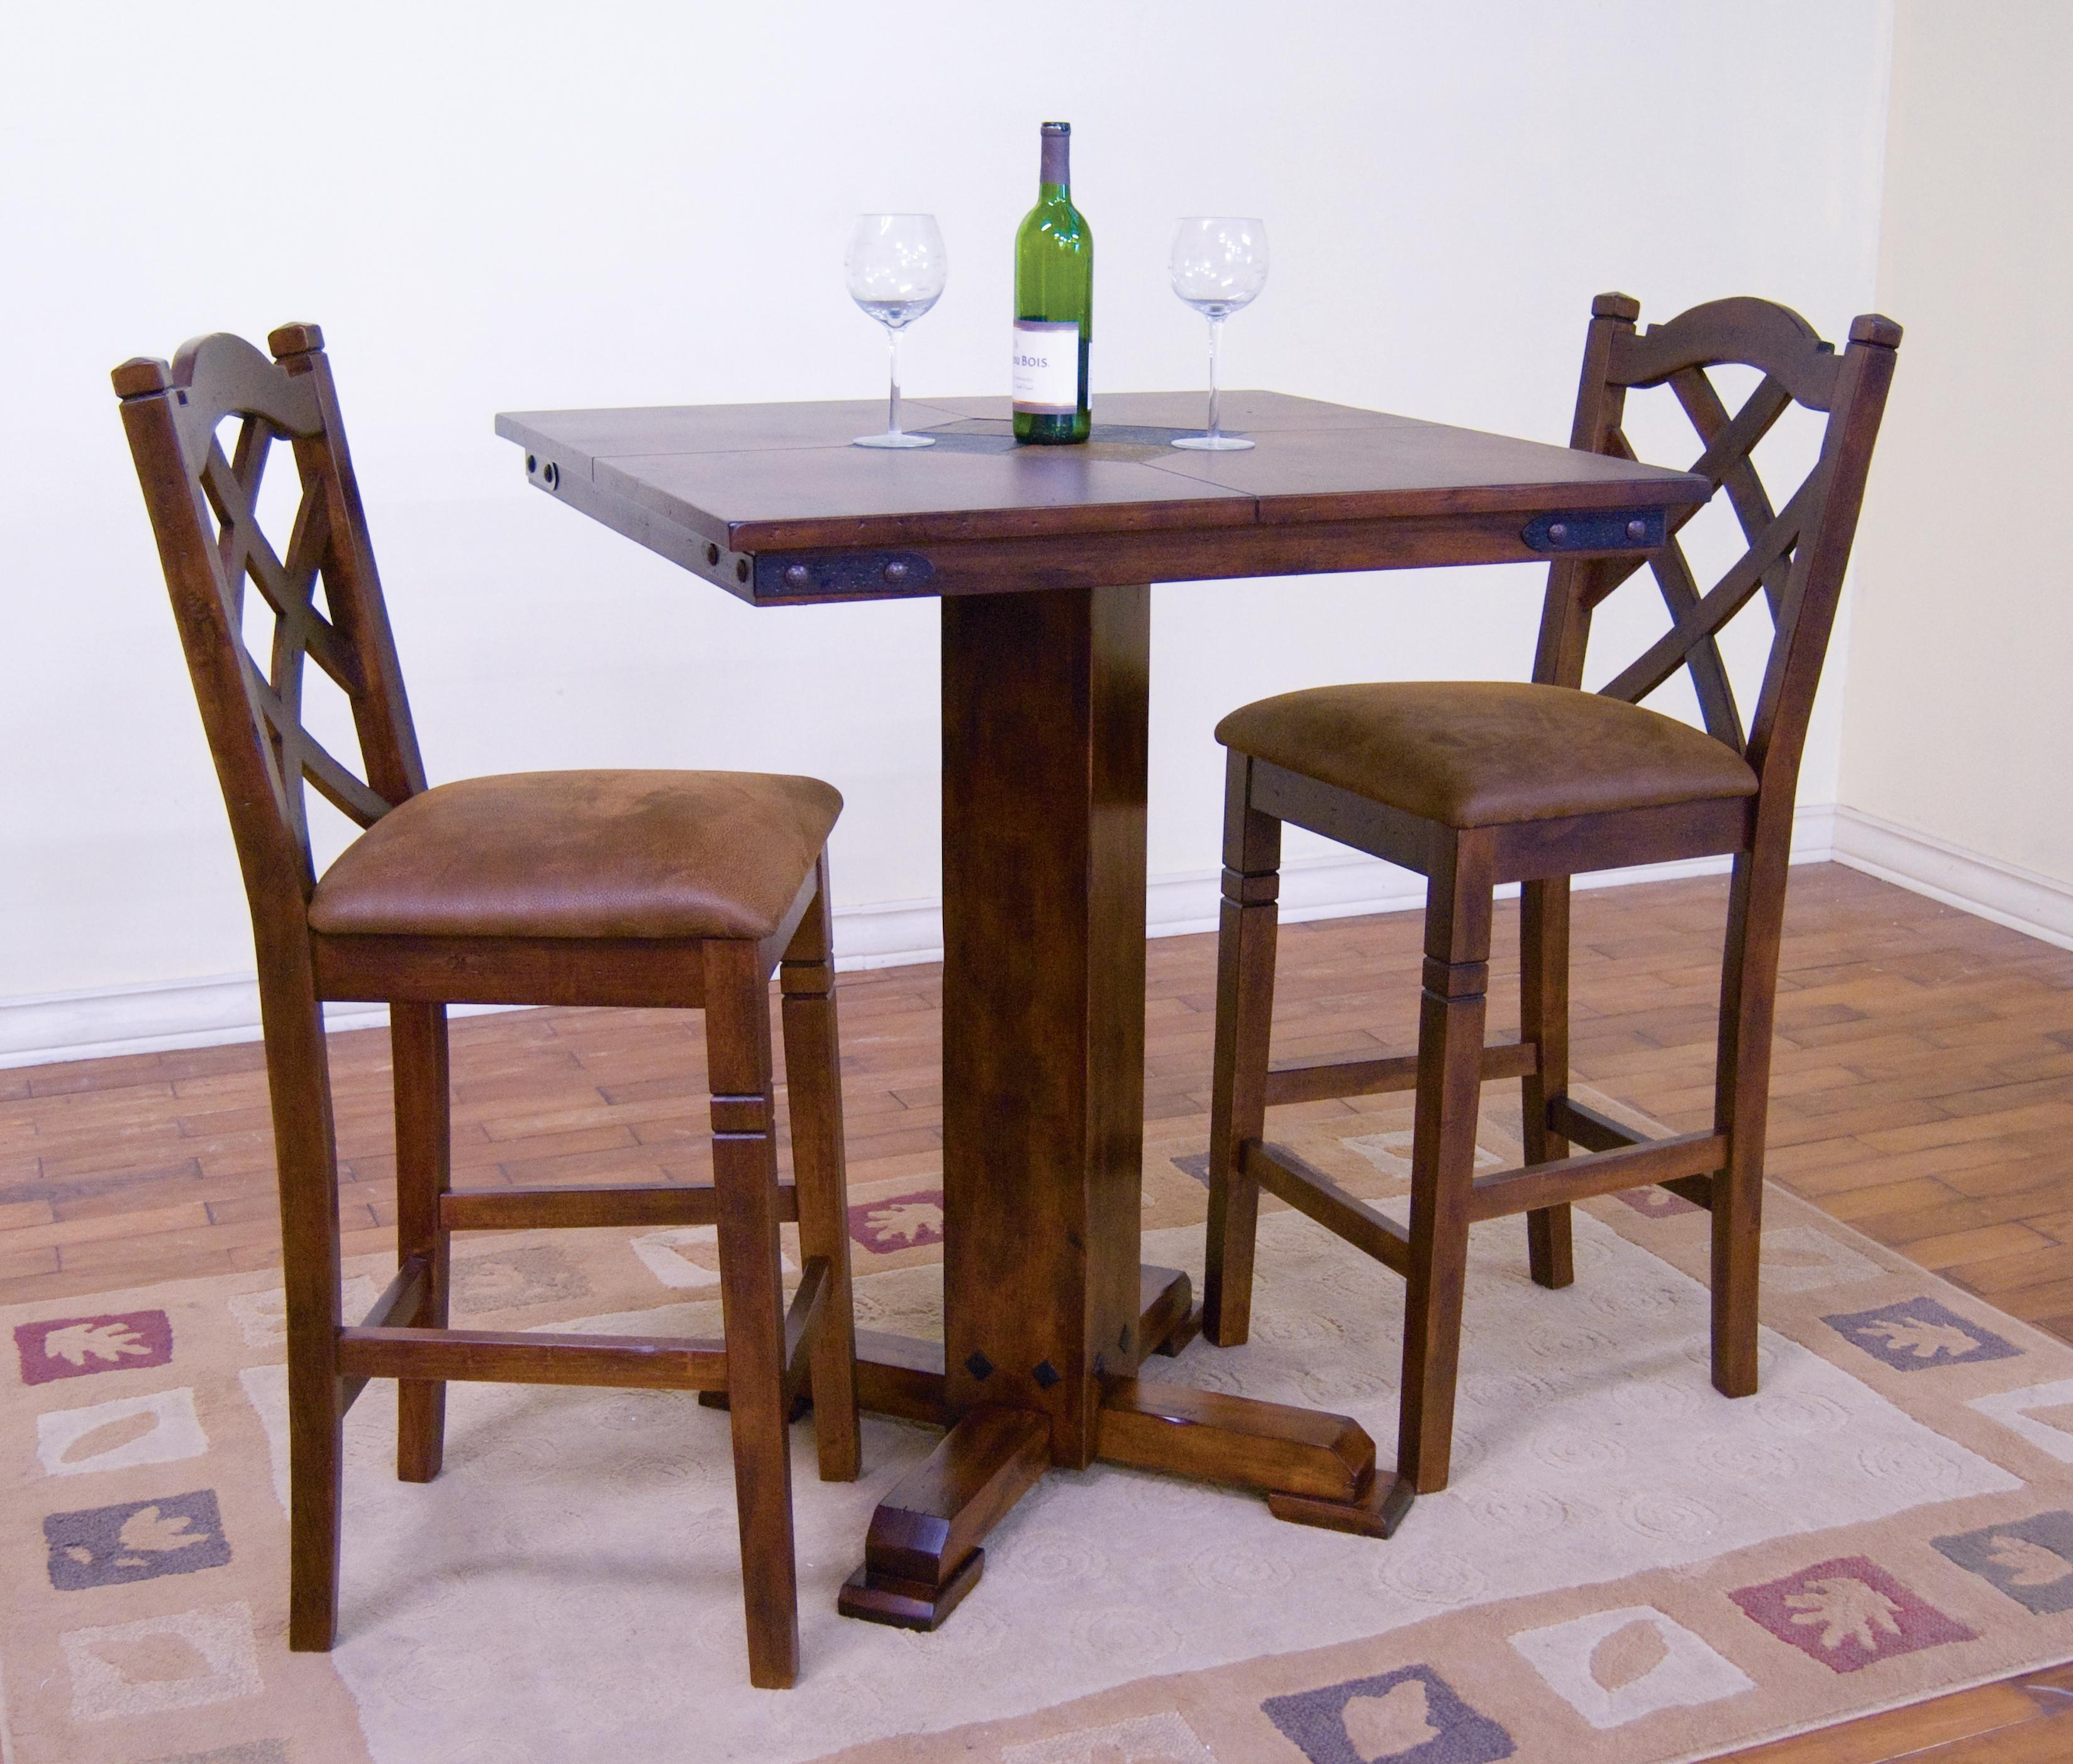 Morris Home Furnishings Morris Home Furnishings Salford 5-Piece Pub Table Set - Item Number: 358892252